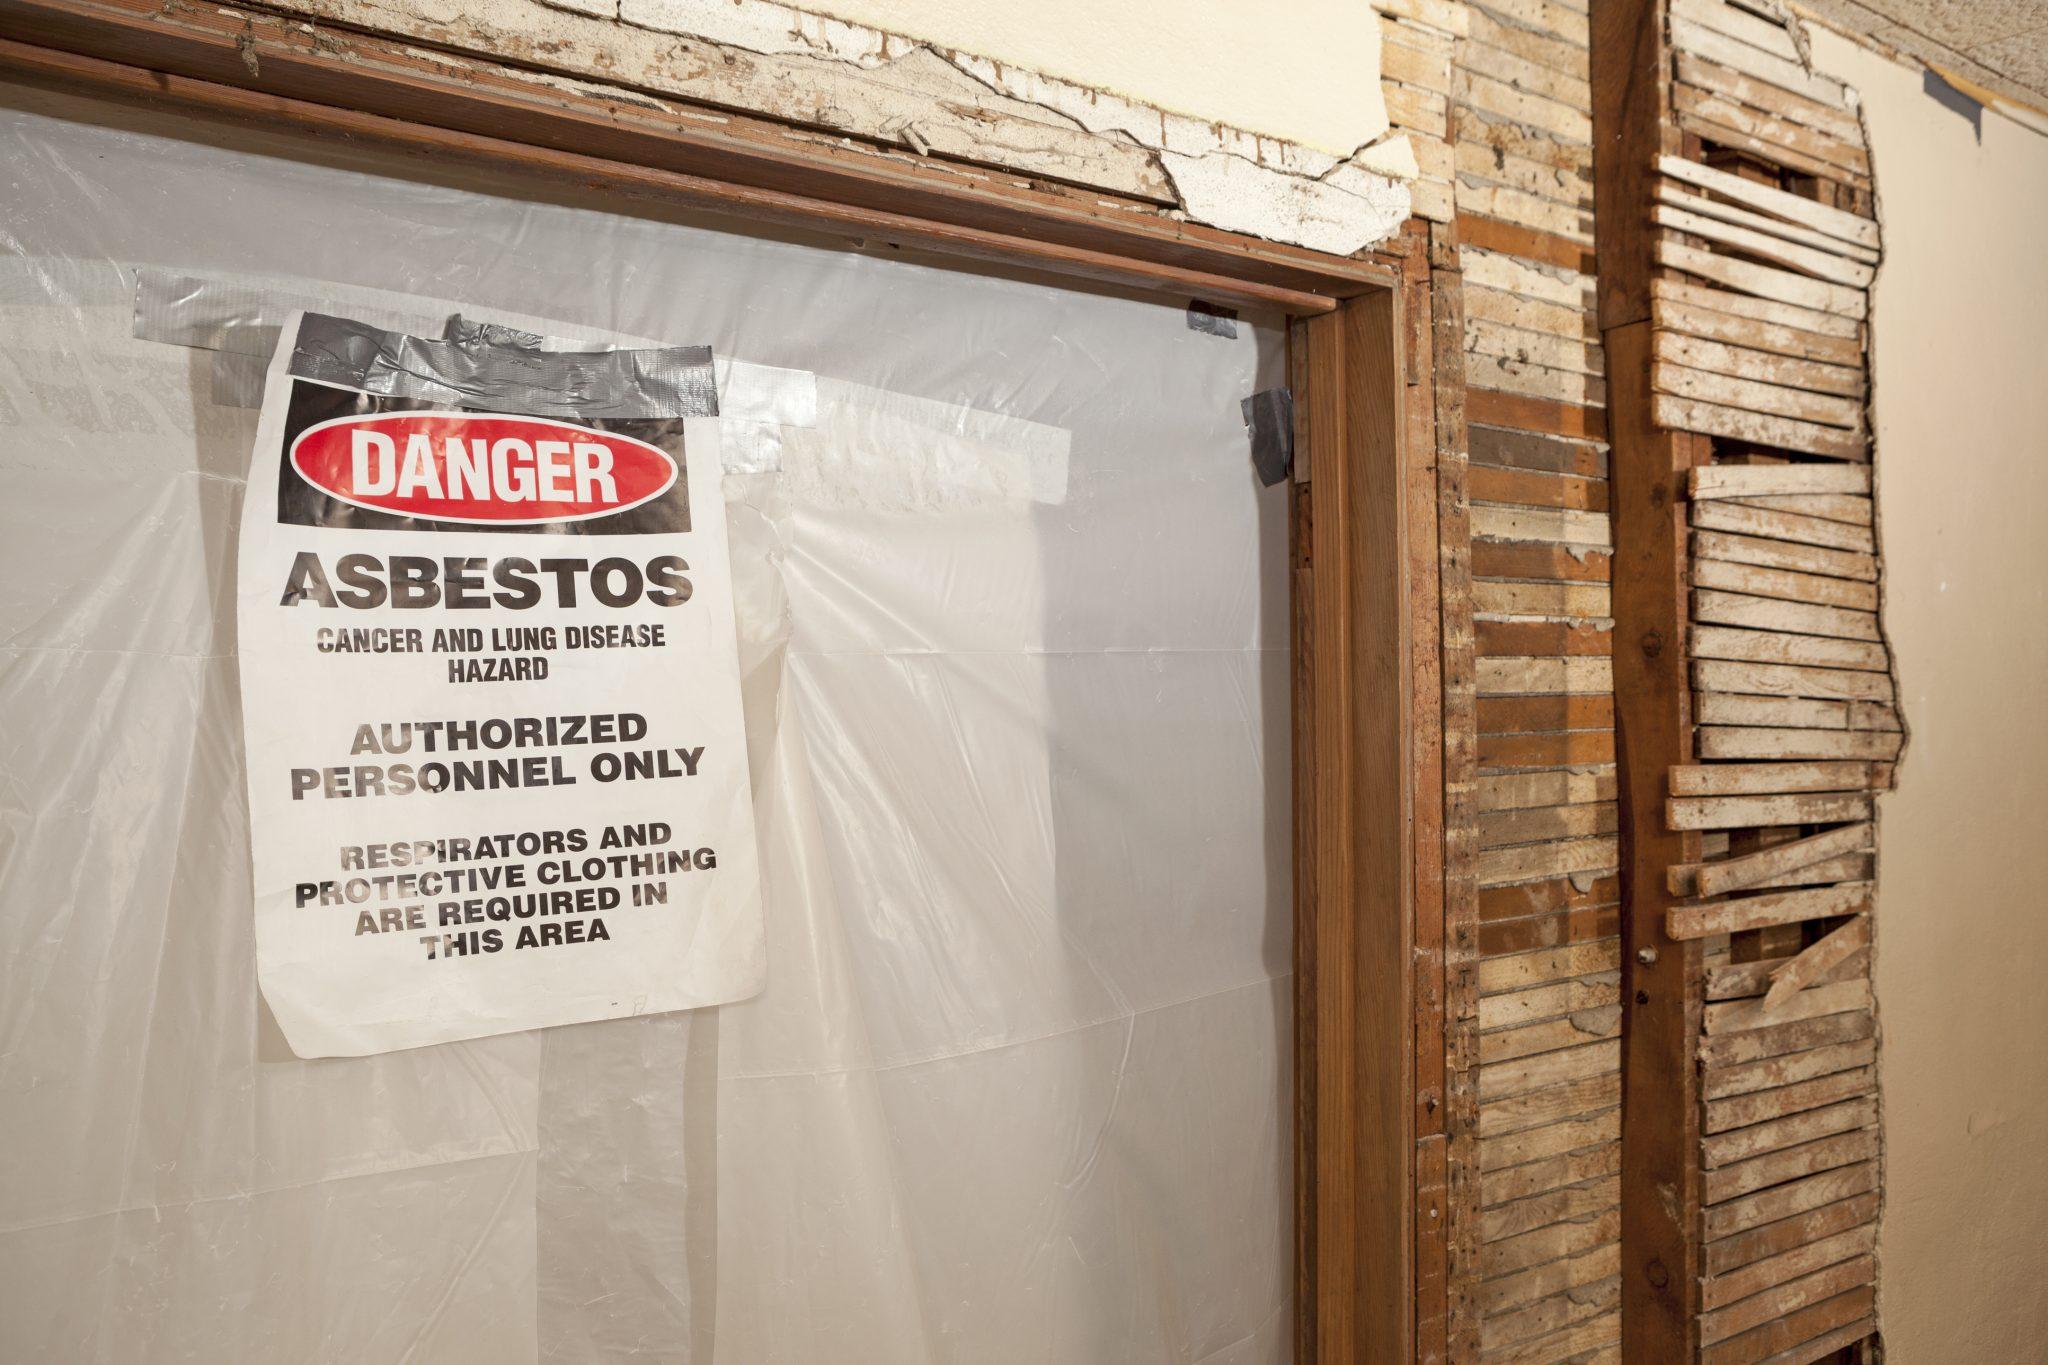 Asbestos remediation NYC